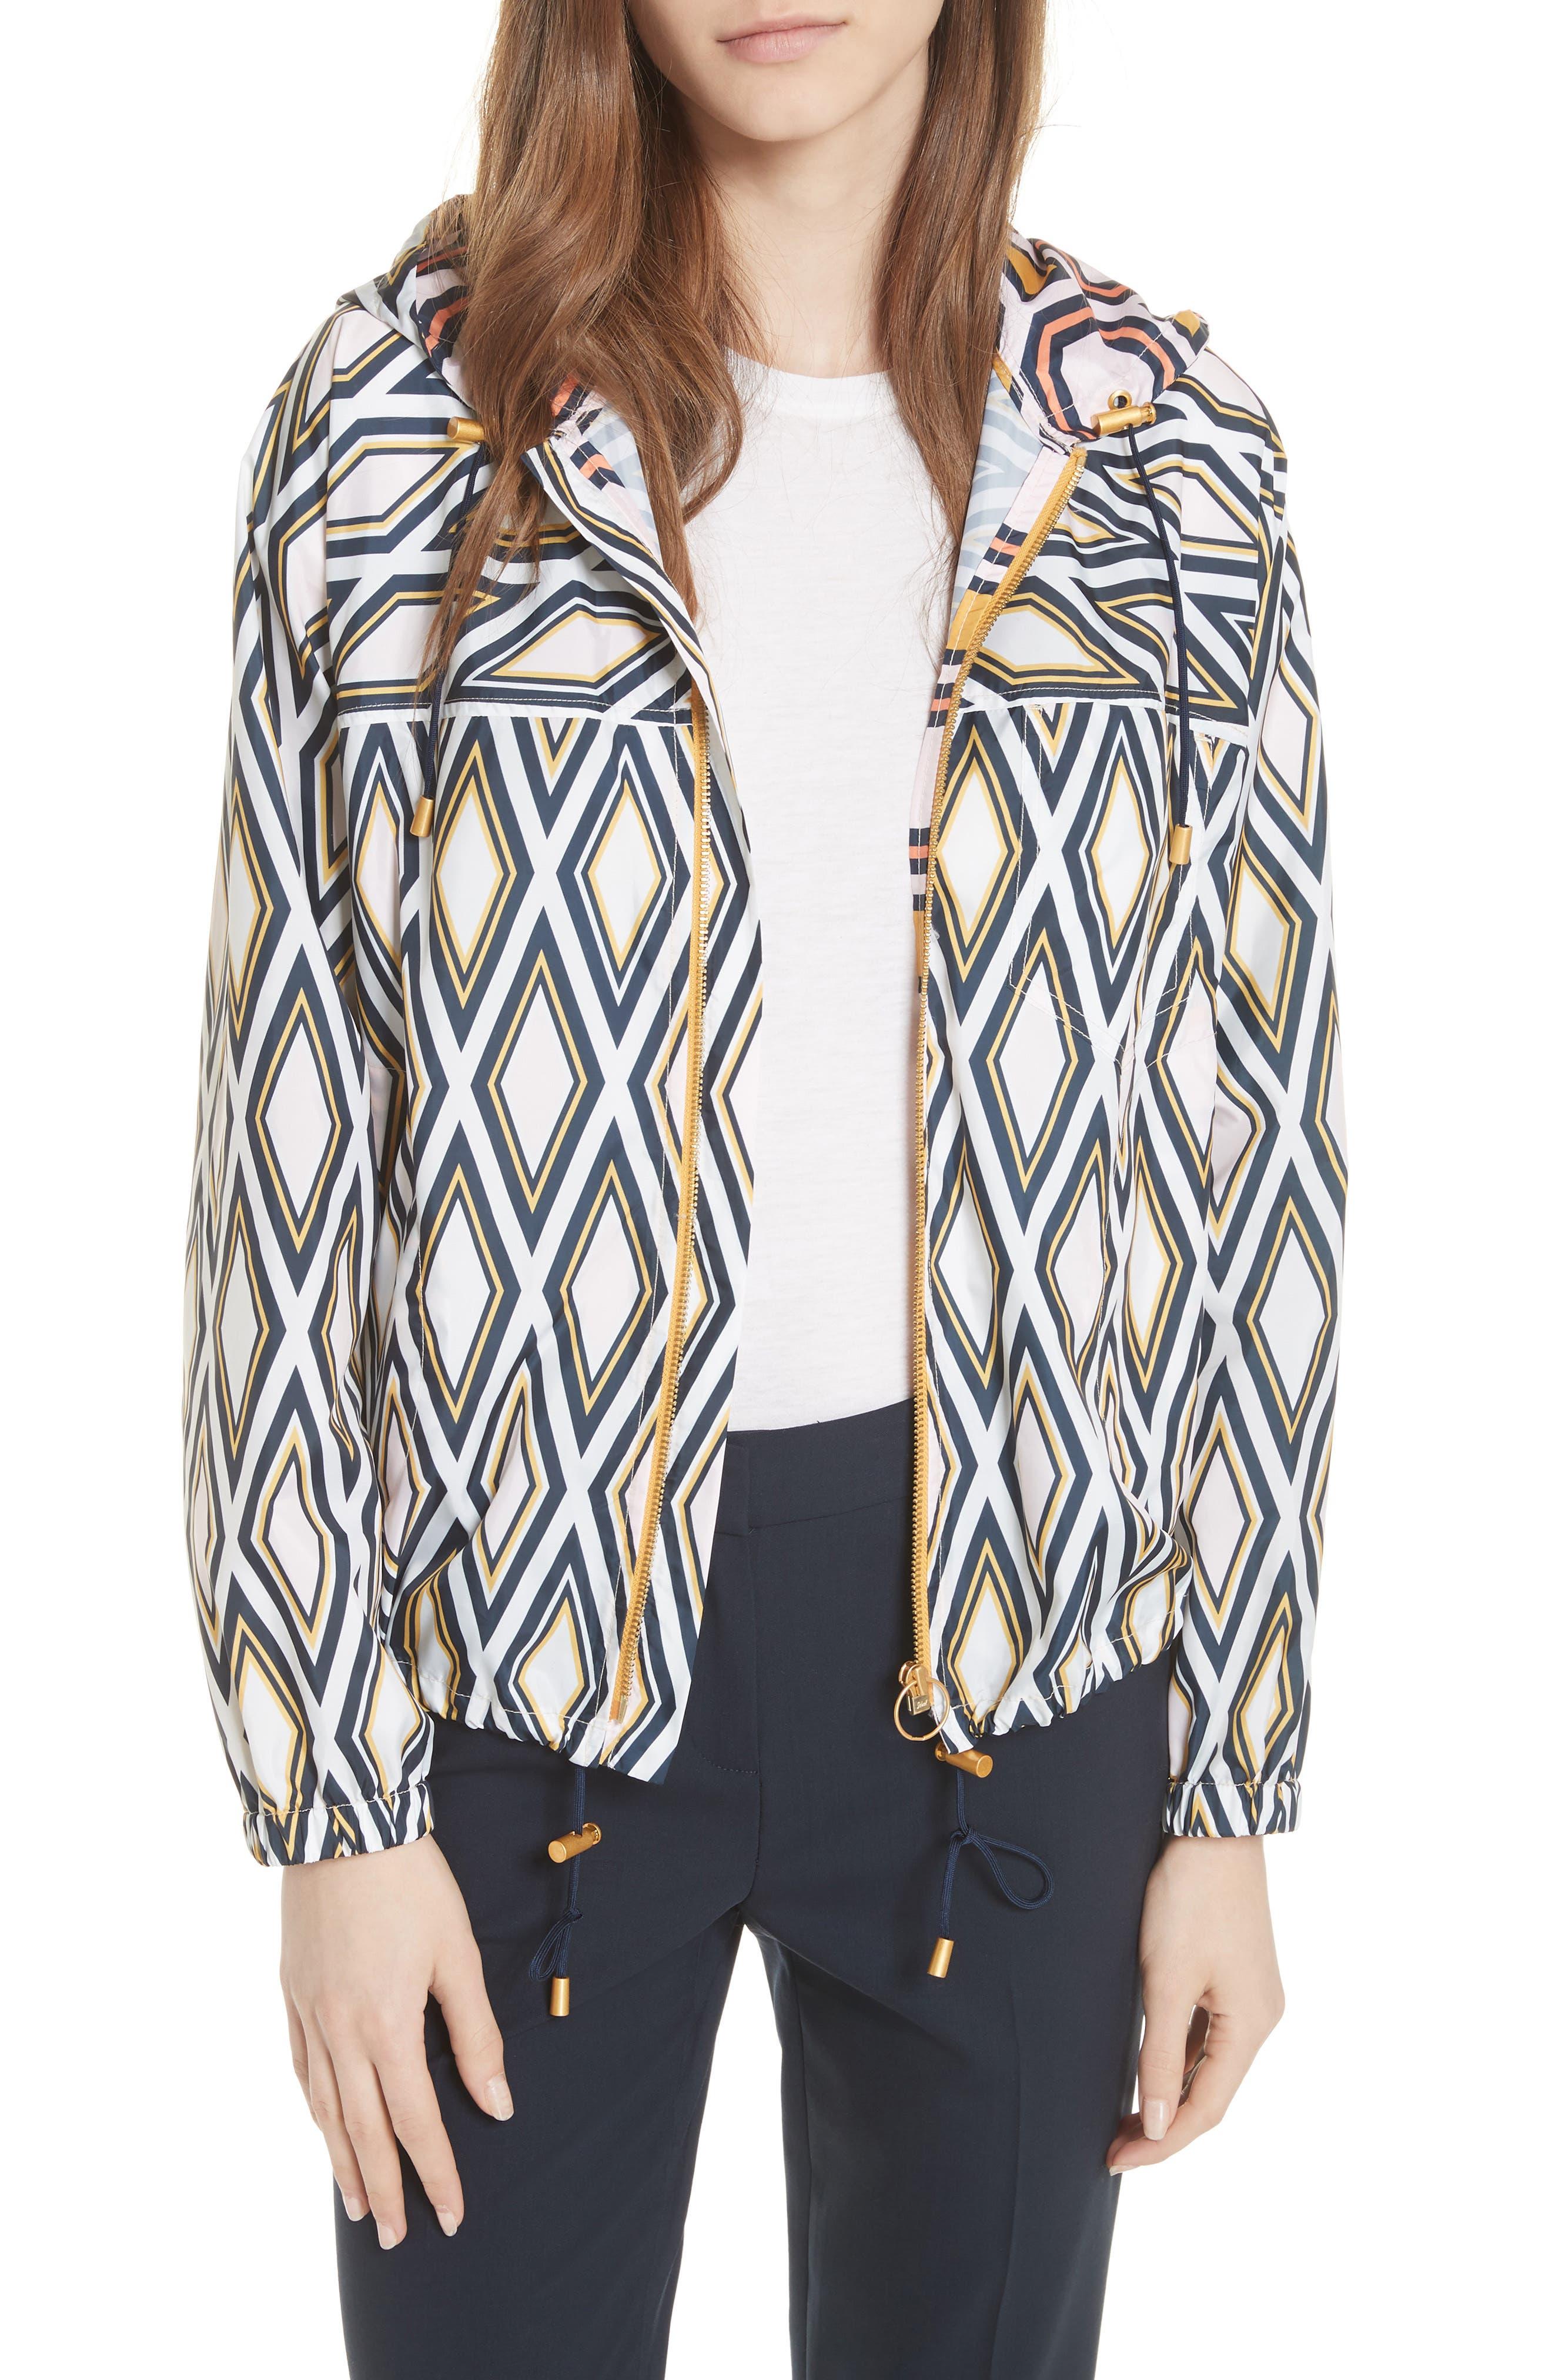 Devon Hooded Jacket,                             Main thumbnail 1, color,                             Solitaire Diamond